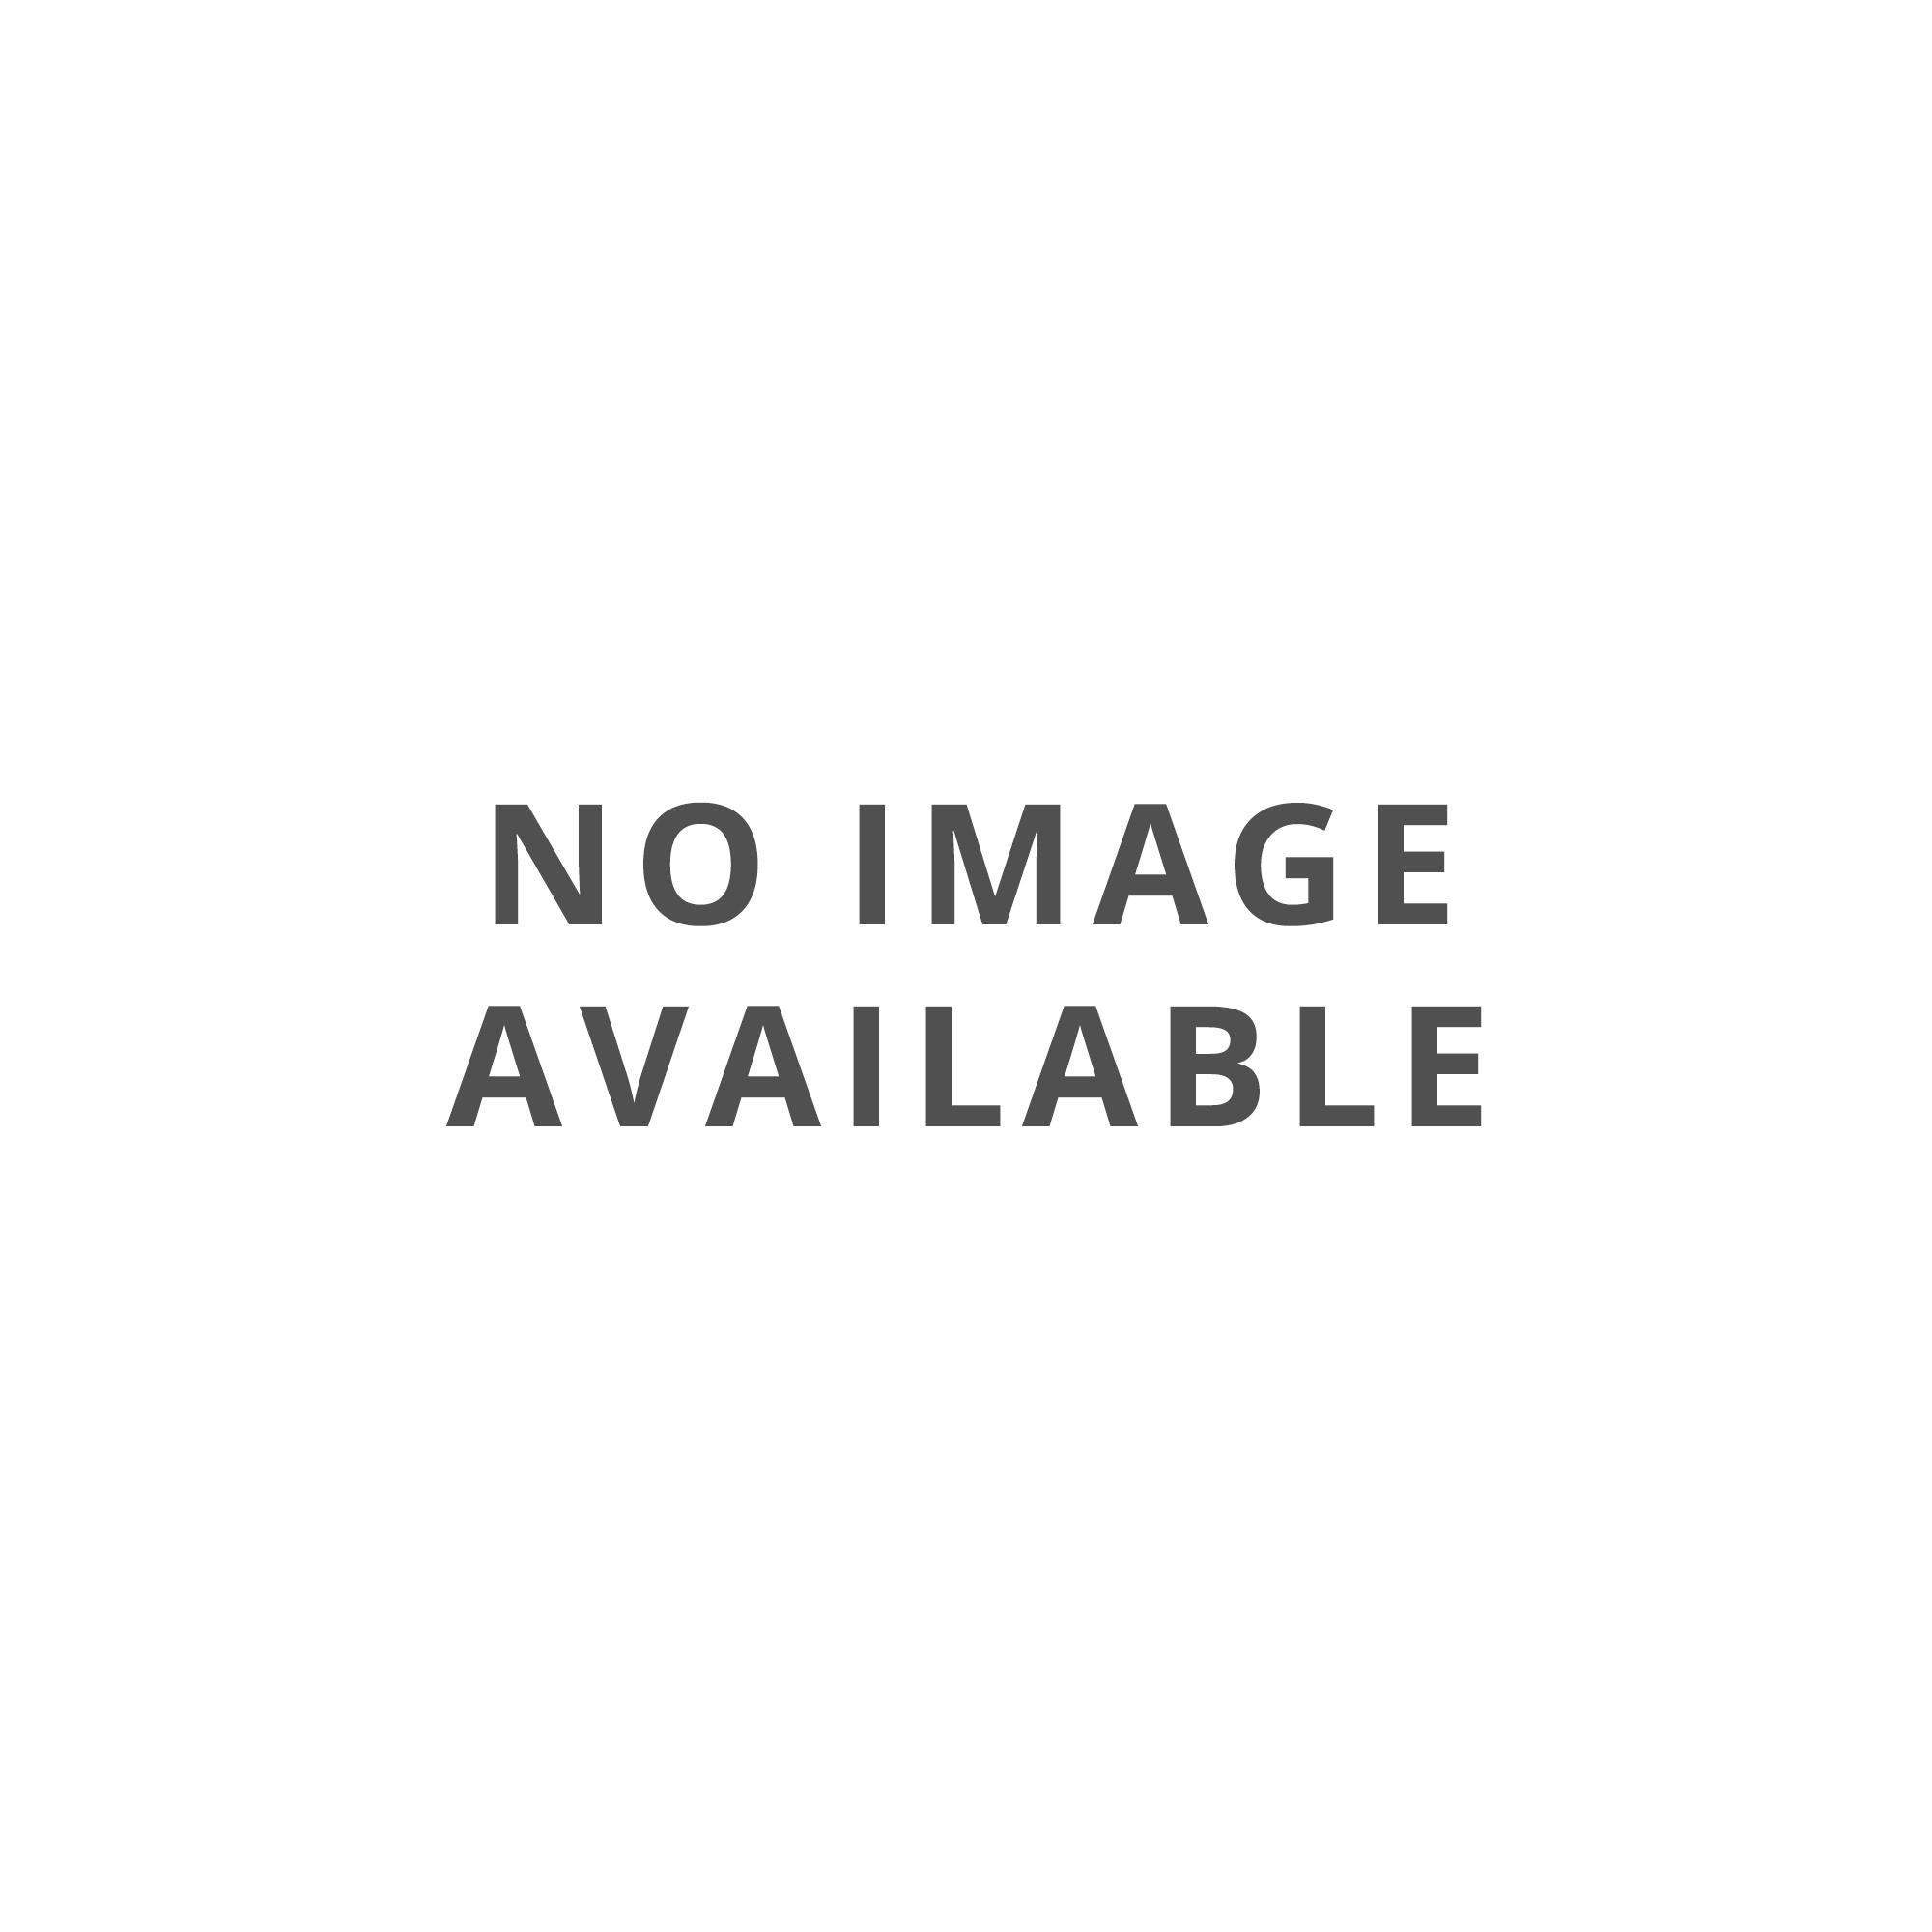 wastes plumbing kits view all mcalpine wastes plumbing kits